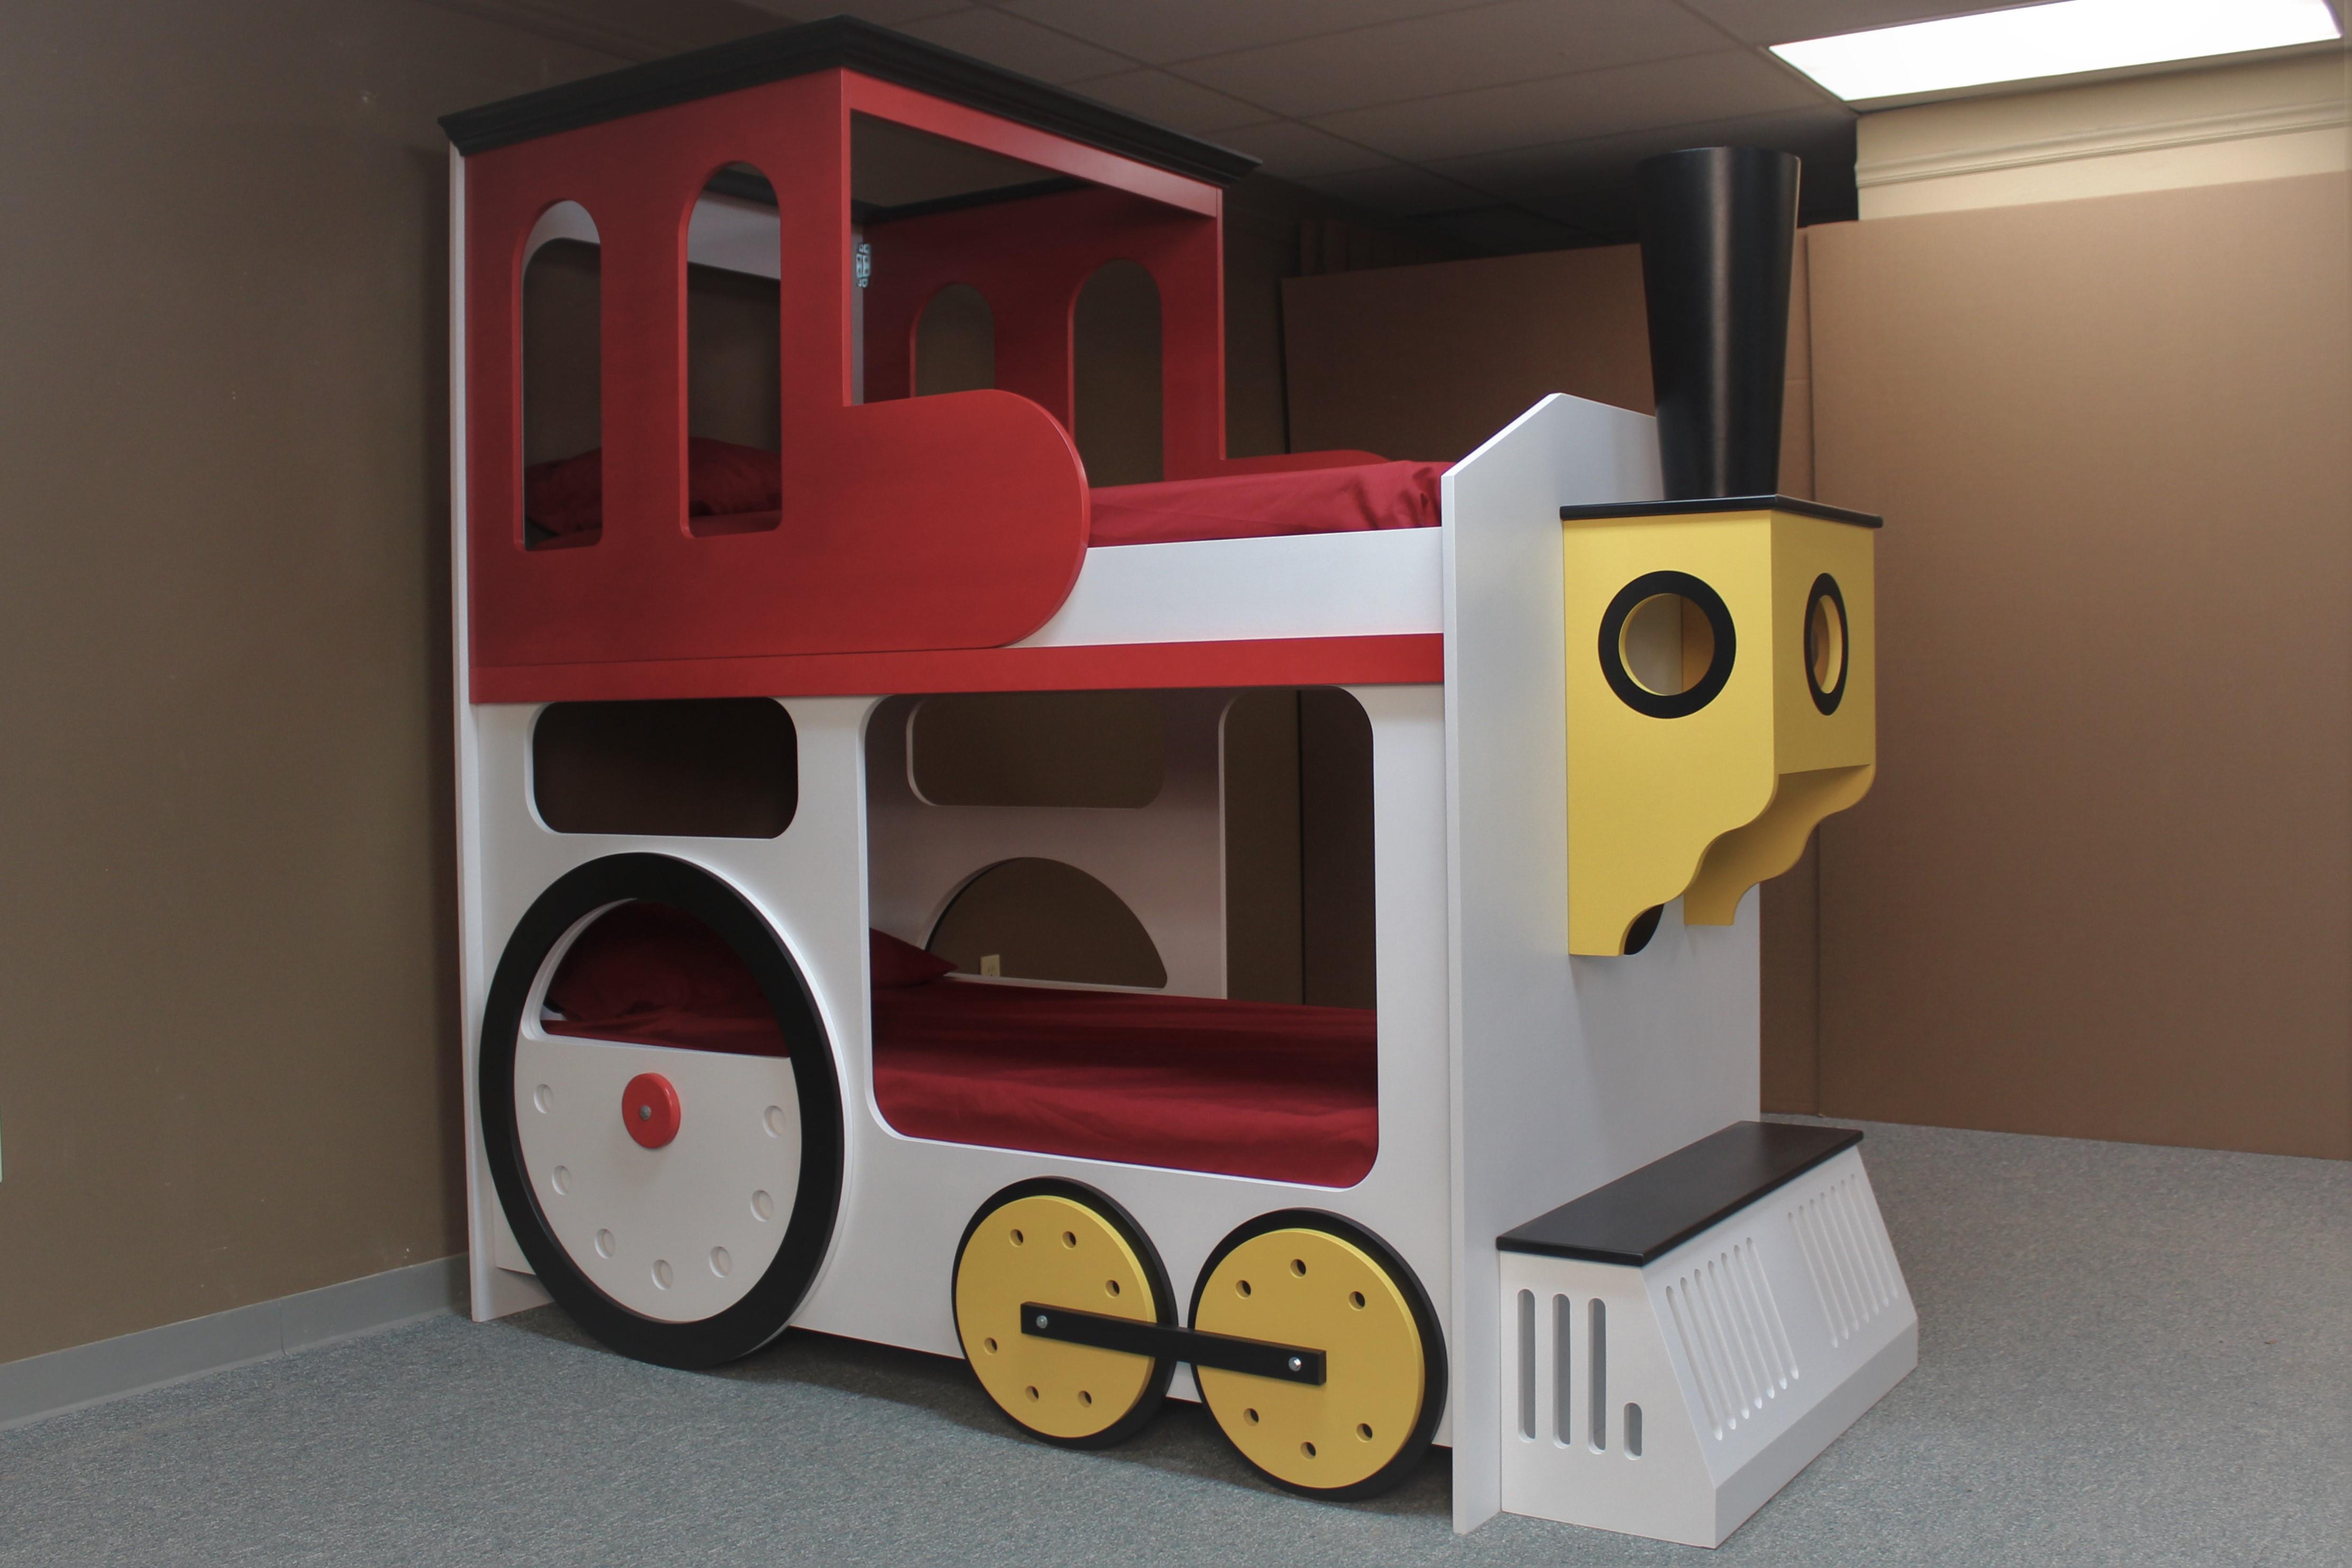 New Train No Ladder